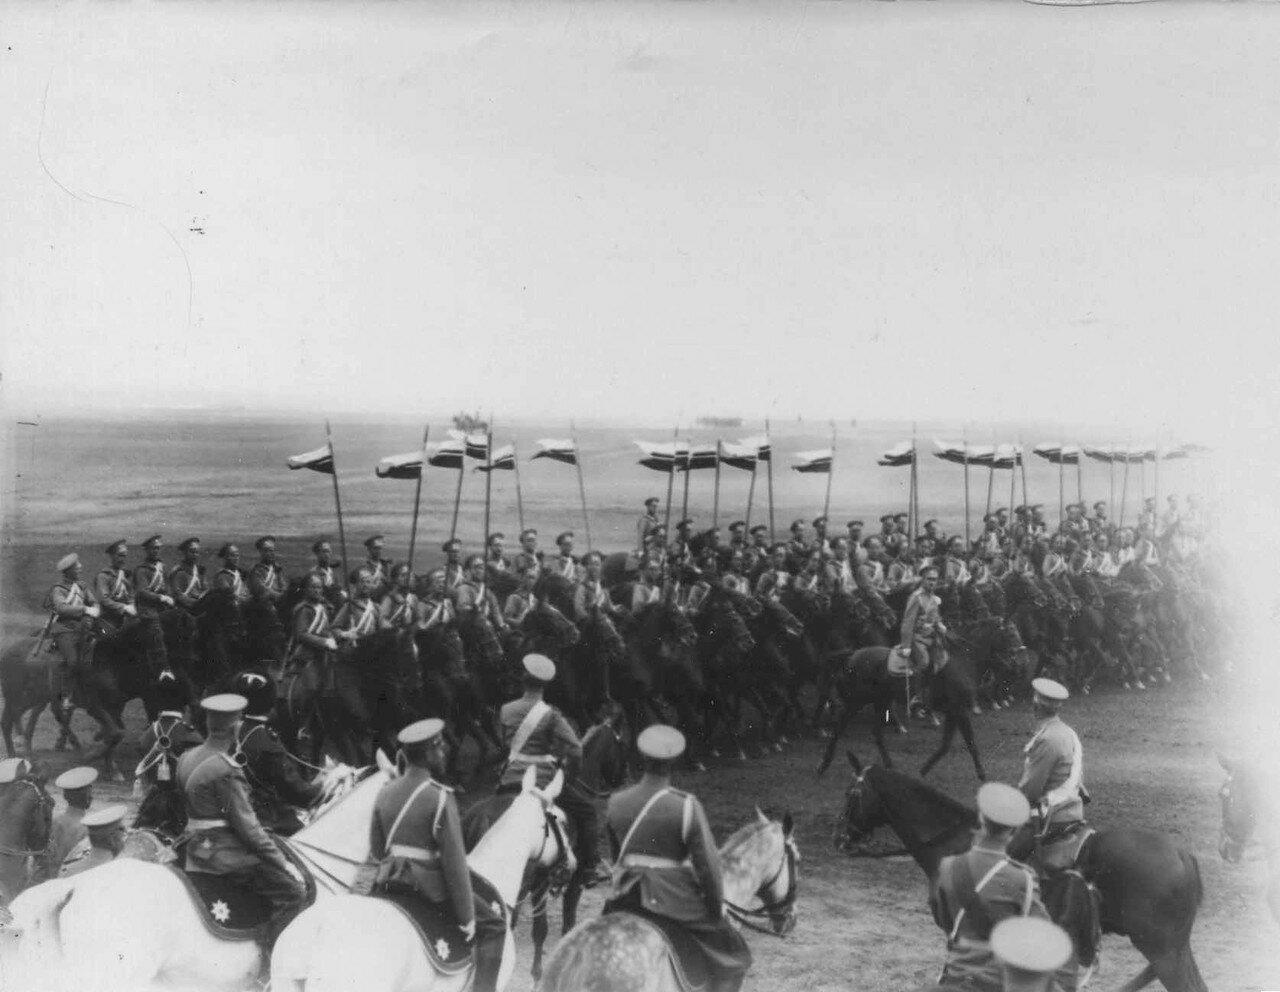 22. Лейб-уланы на марш-параде. 30 июля 1912